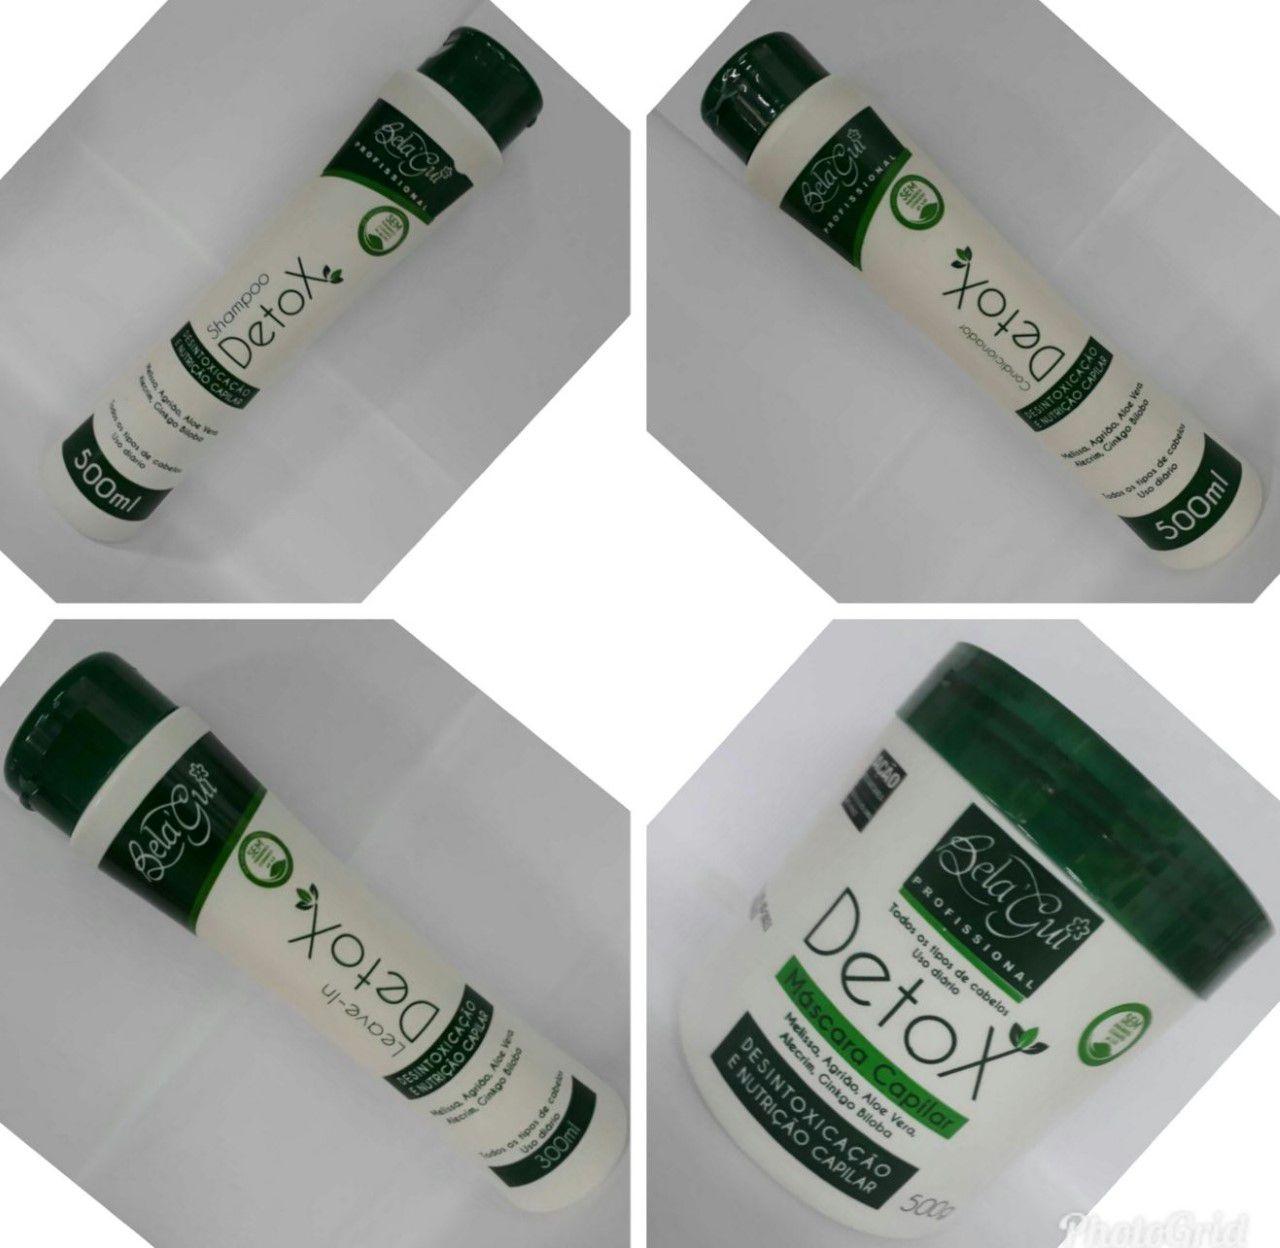 Kit Tratamento Capilar Profissional Detox  - MagnePhoton